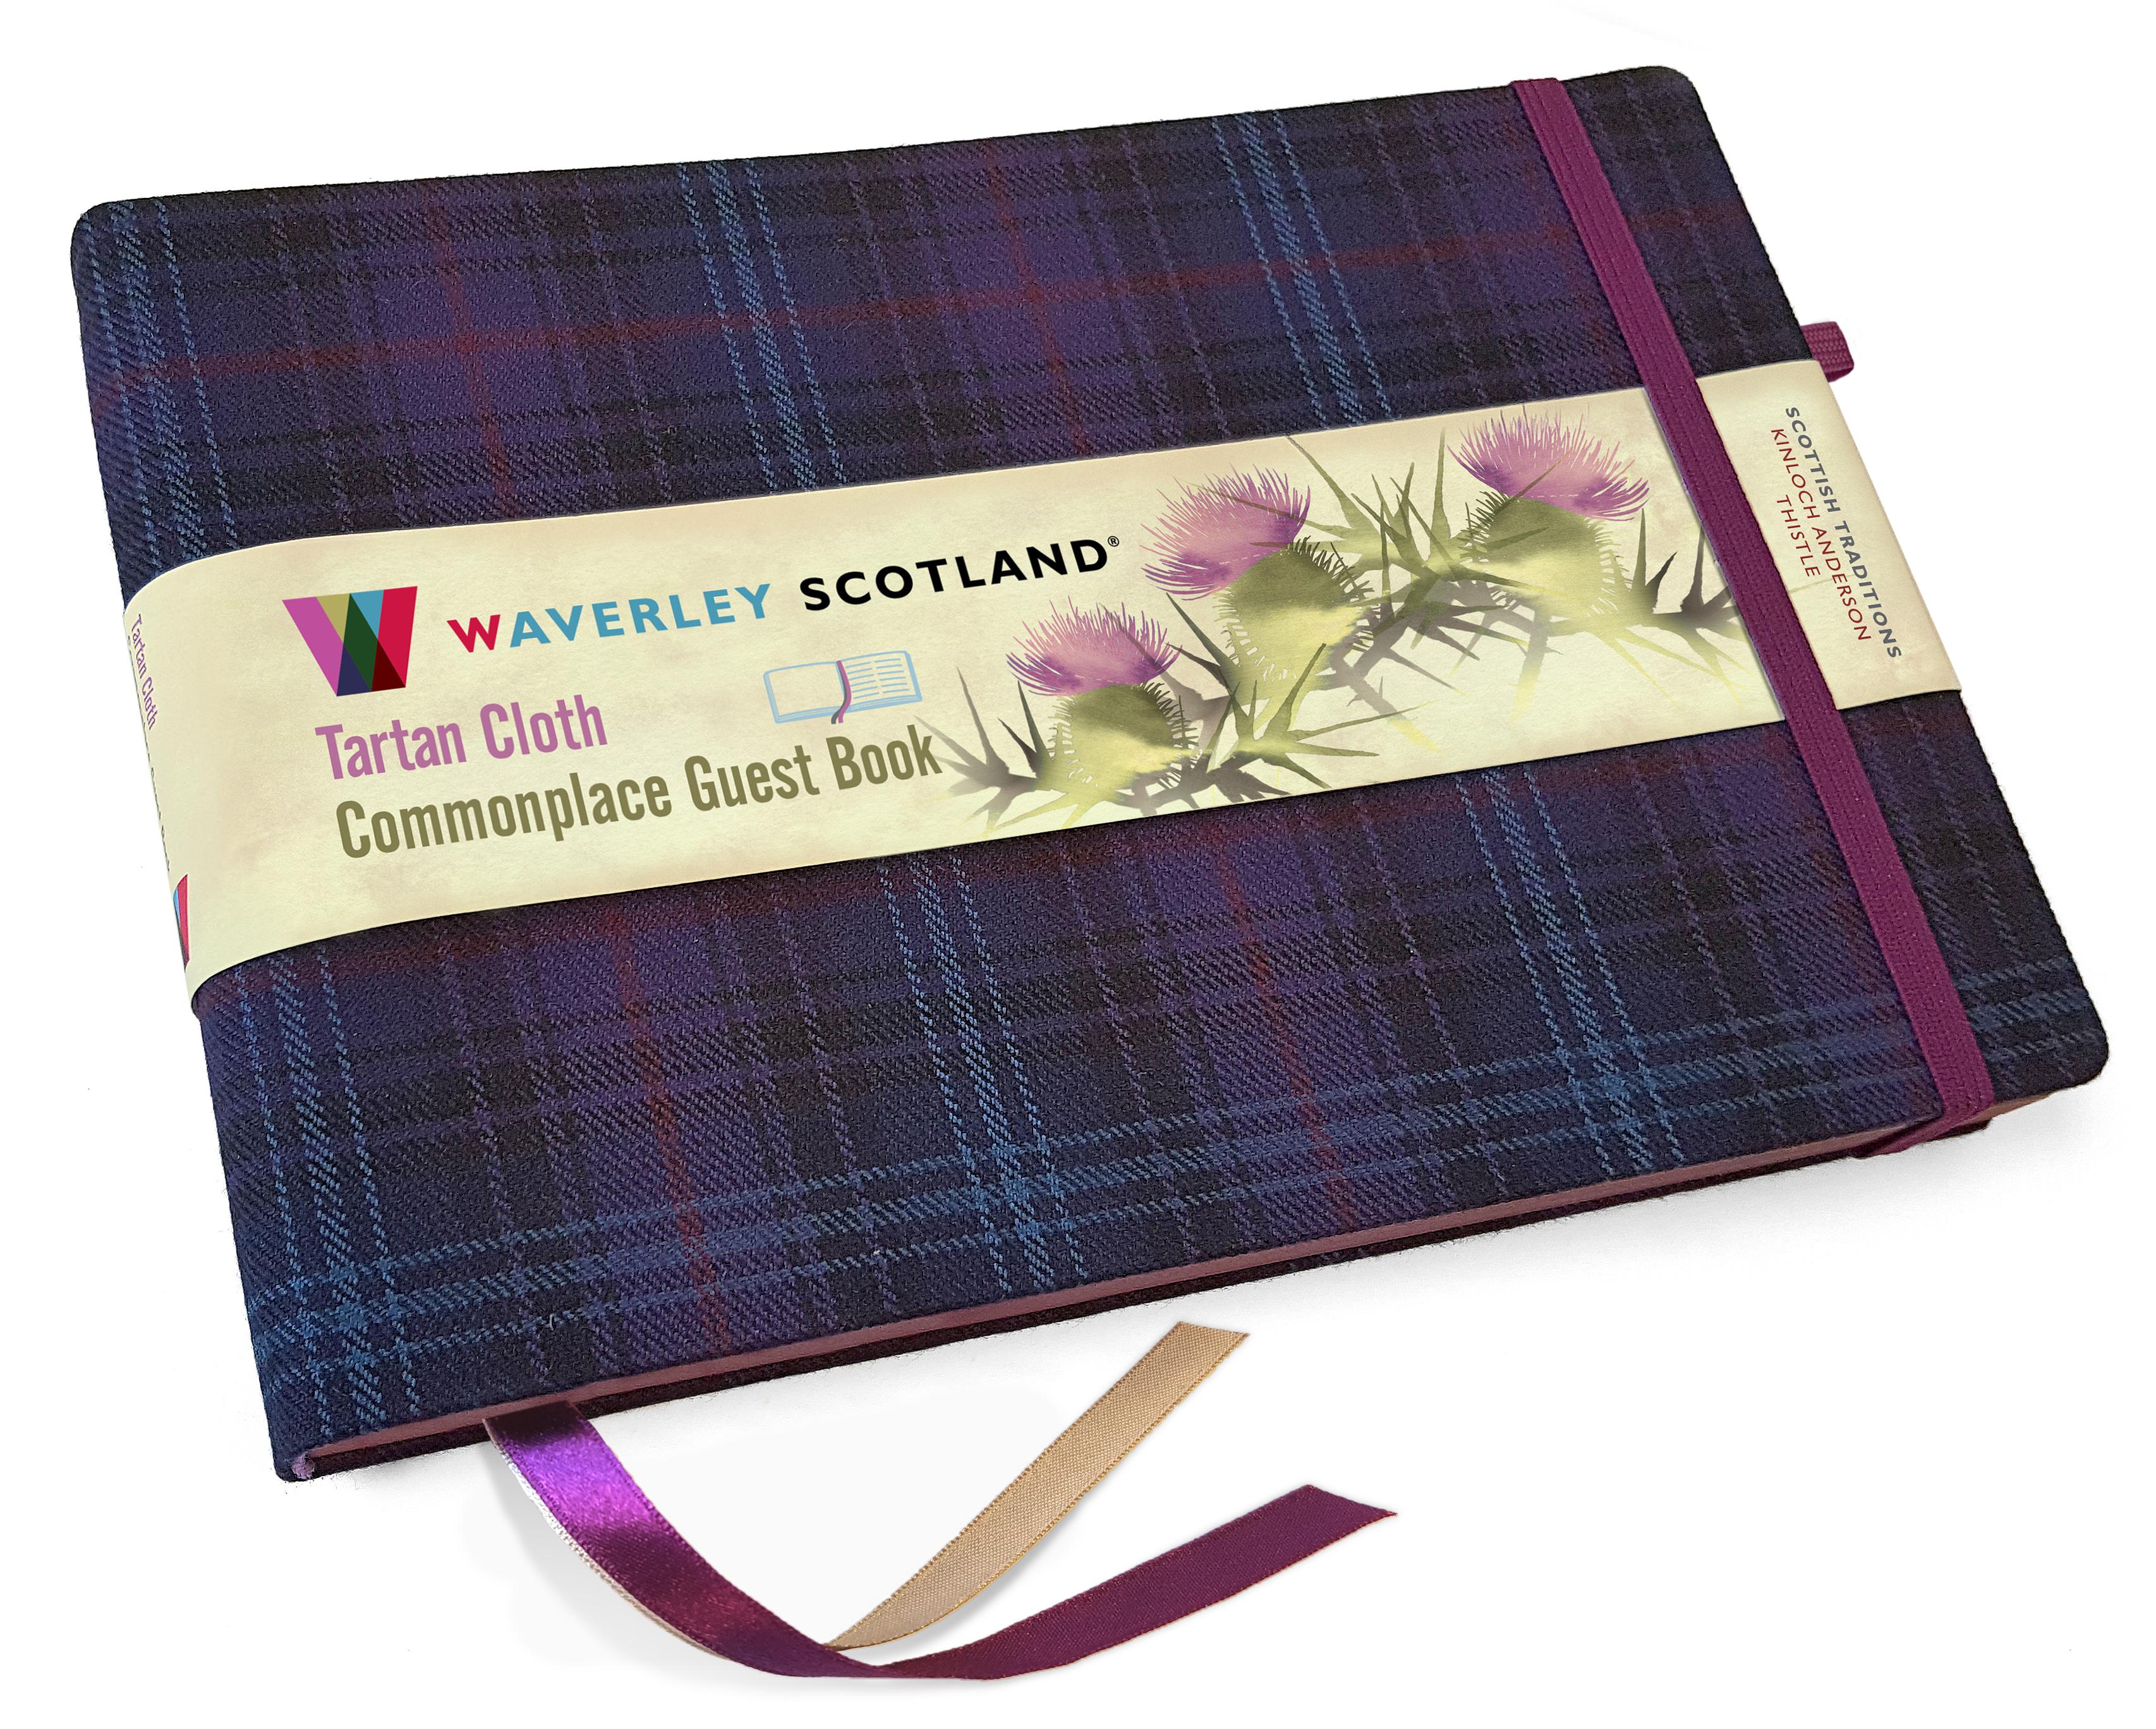 Guest Book Waverley Scotland Kinloch Anderson Thistle tartan